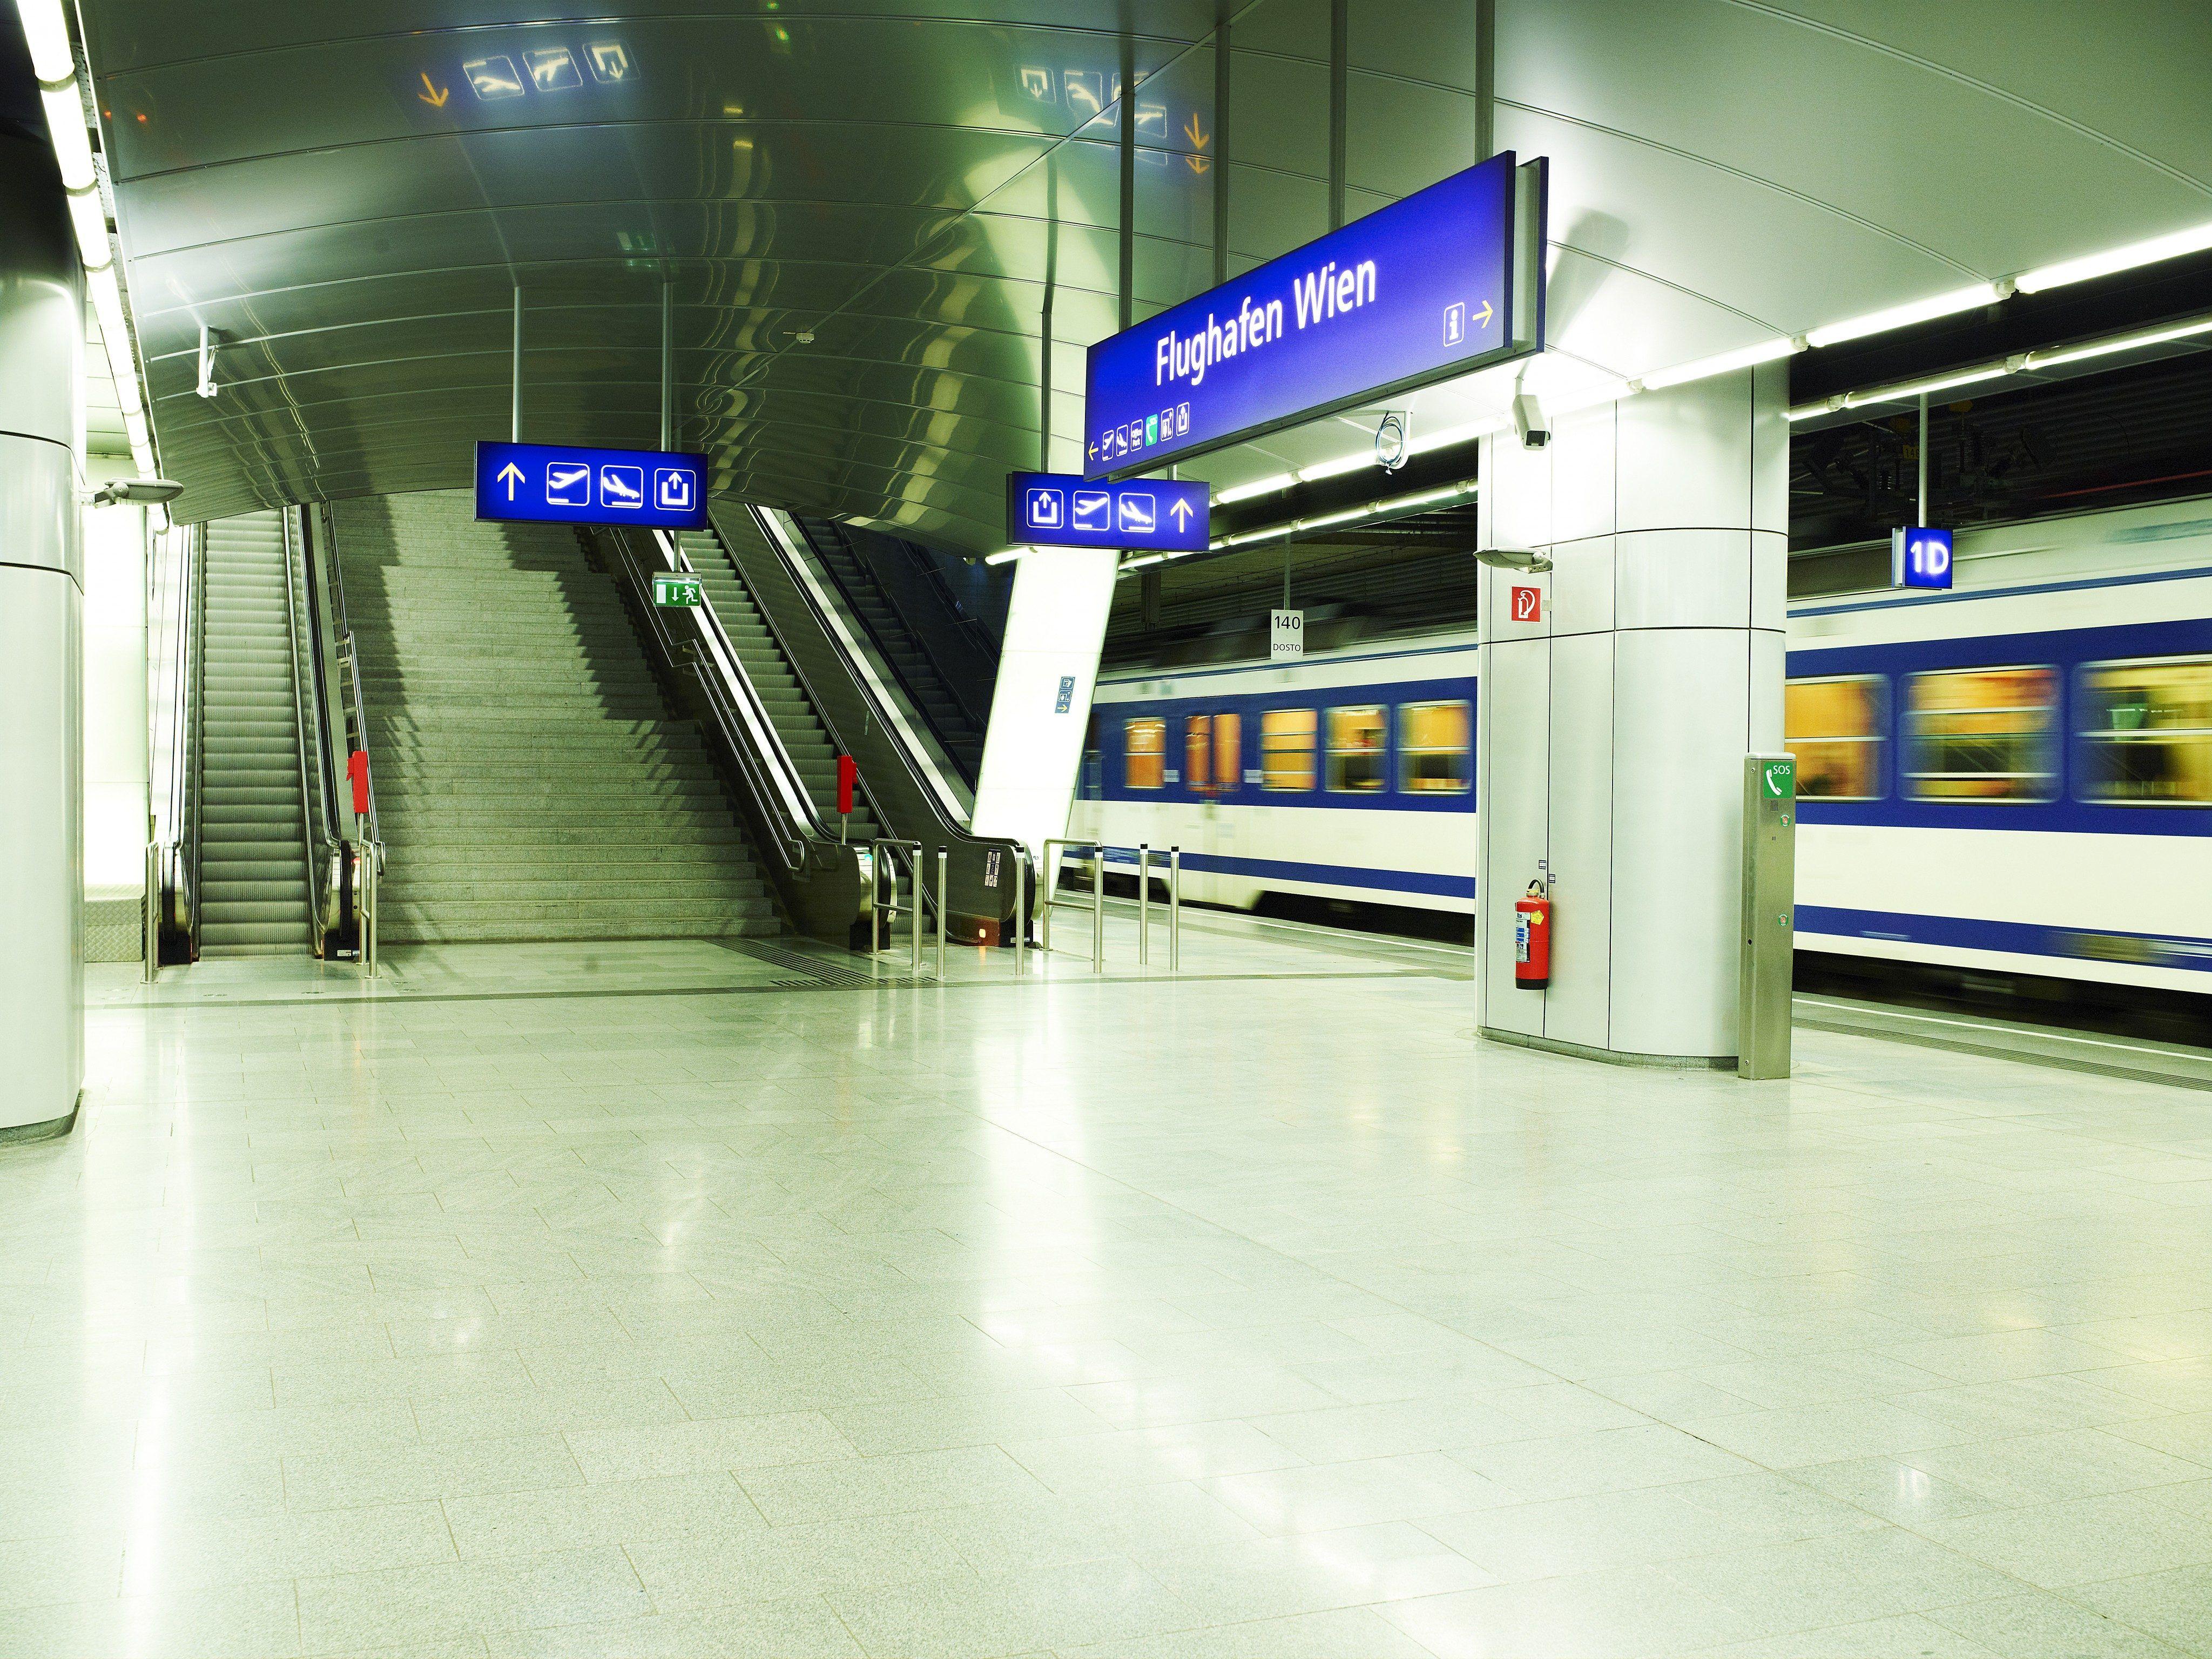 Flughafen Schnellbahn S7 Mit Taktverdichtung Ab September